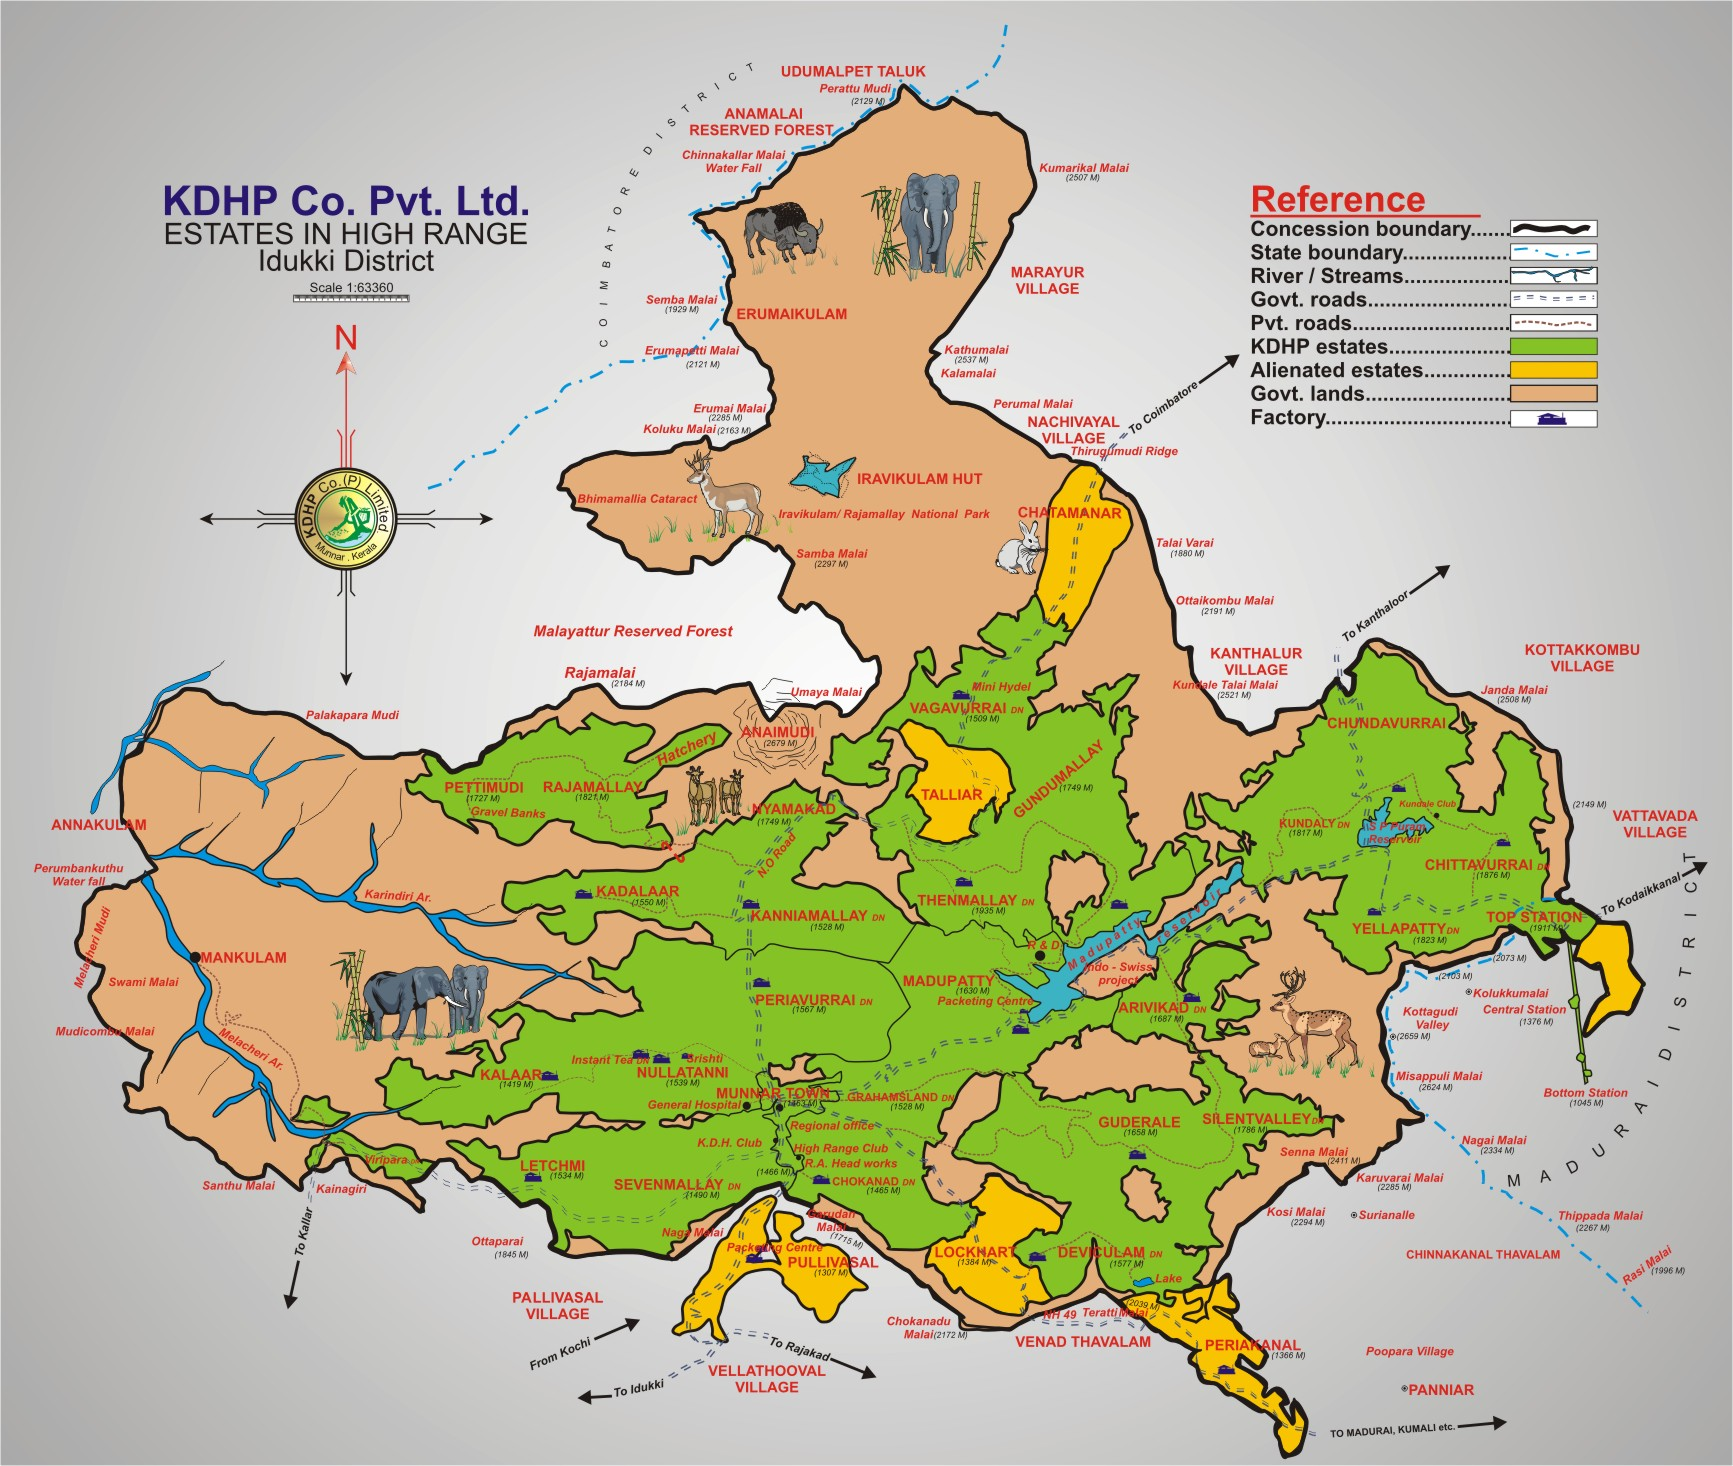 idukki district estate map  munnar kerala india • mappery -